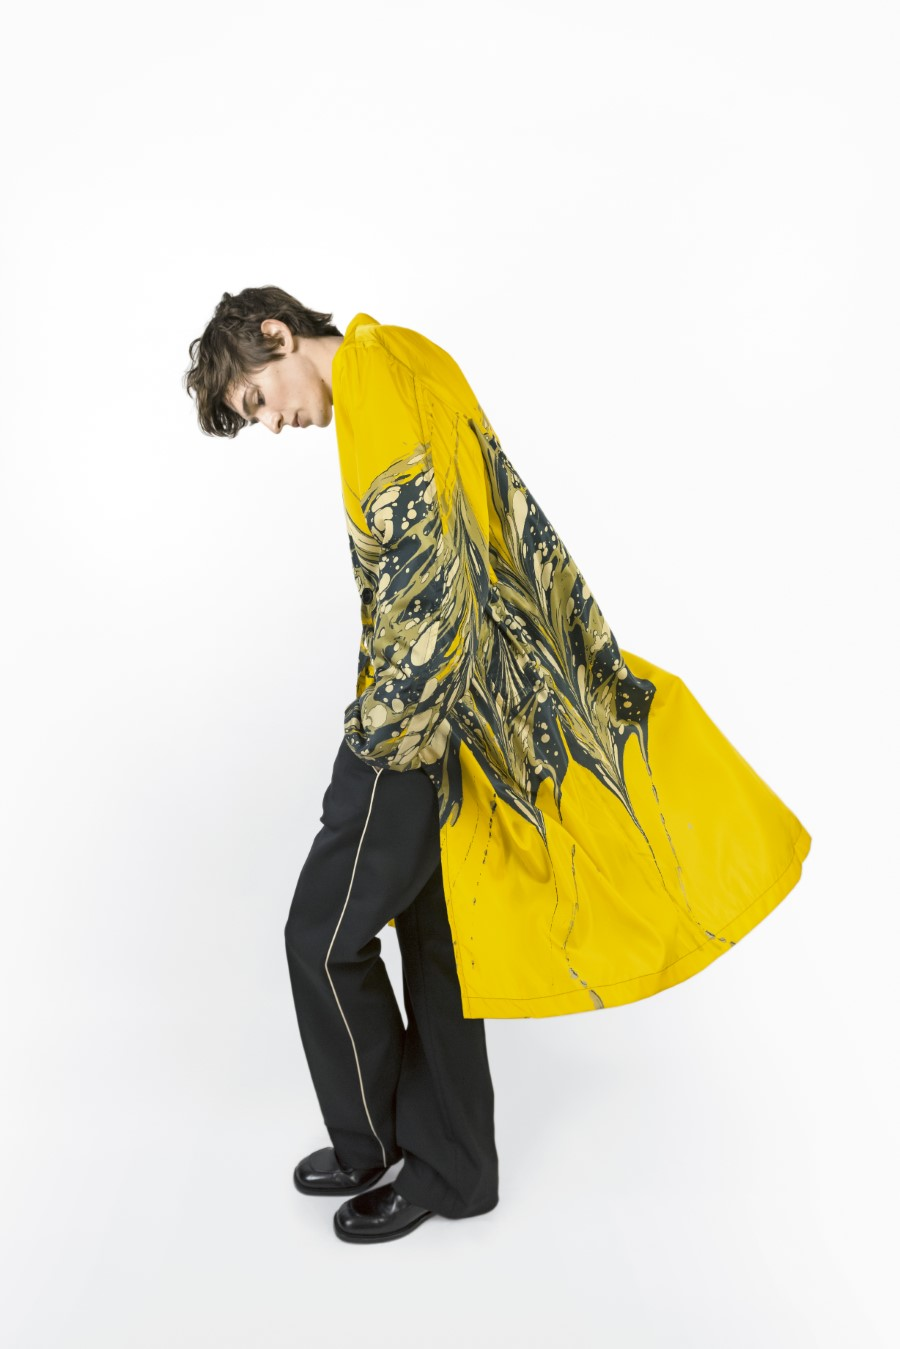 Dries Van Noten Limited edition marble print raincoats